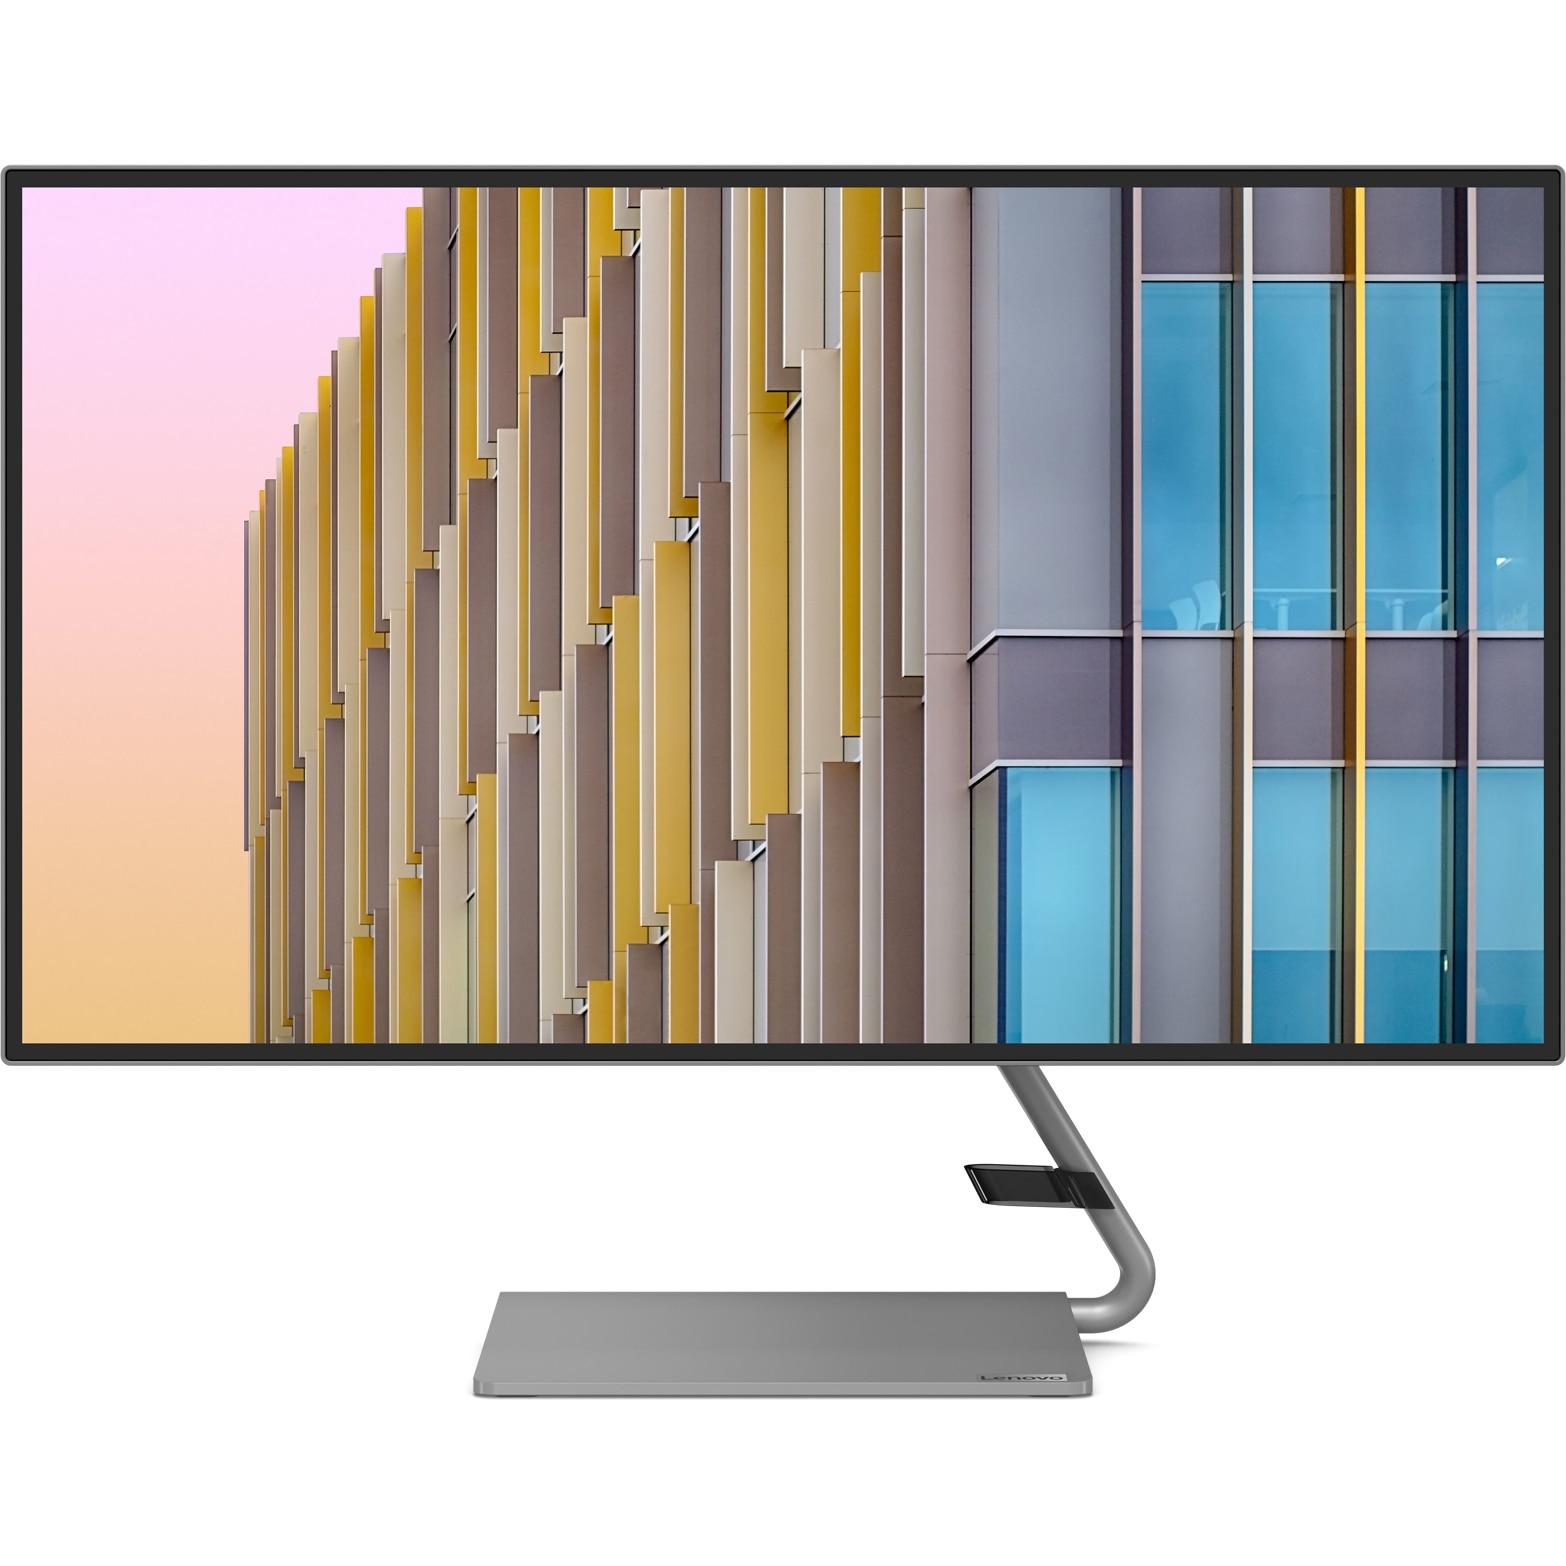 "Fotografie Monitor LED IPS Lenovo 27"", WQHD, Display Port, 75 Hz, 4 ms, DP+HDMI+USB Type-C 4-side borderless with speakers (2x 3W) - Raven Black / Iron Grey Stand, Q27h-10"